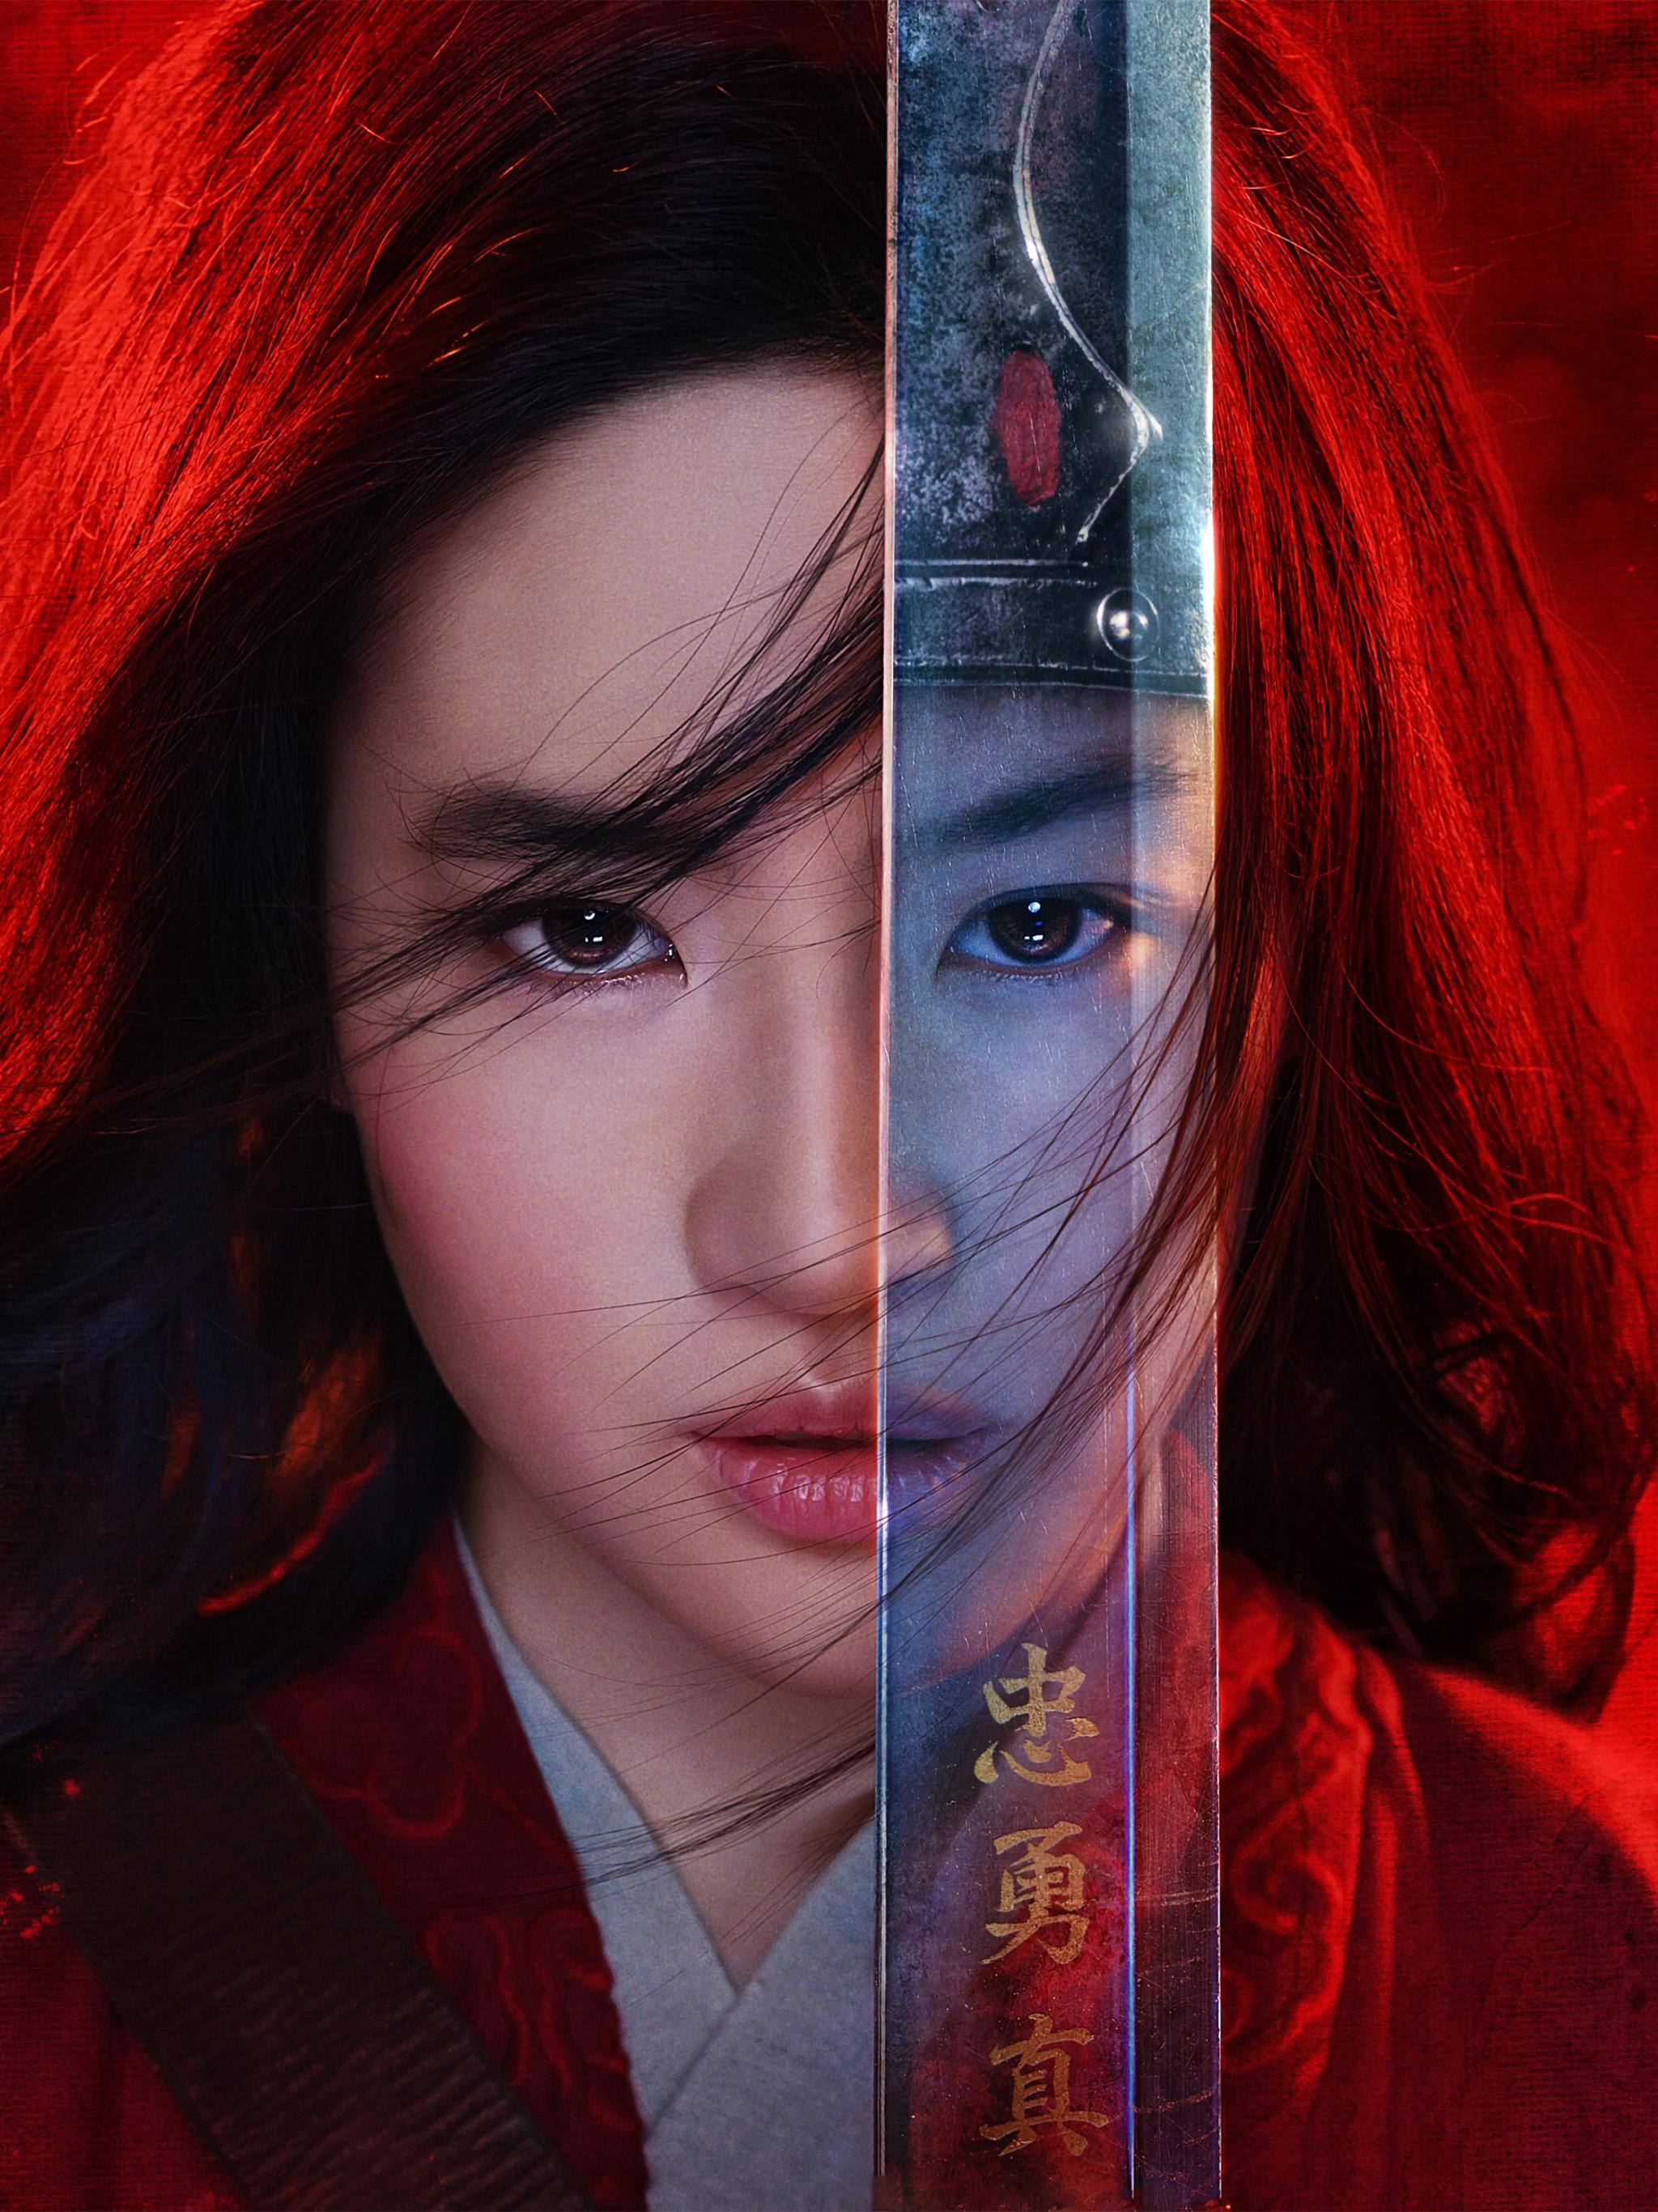 2048x2732 Mulan 2020 Movie Poster 2048x2732 Resolution Wallpaper 2048x2732